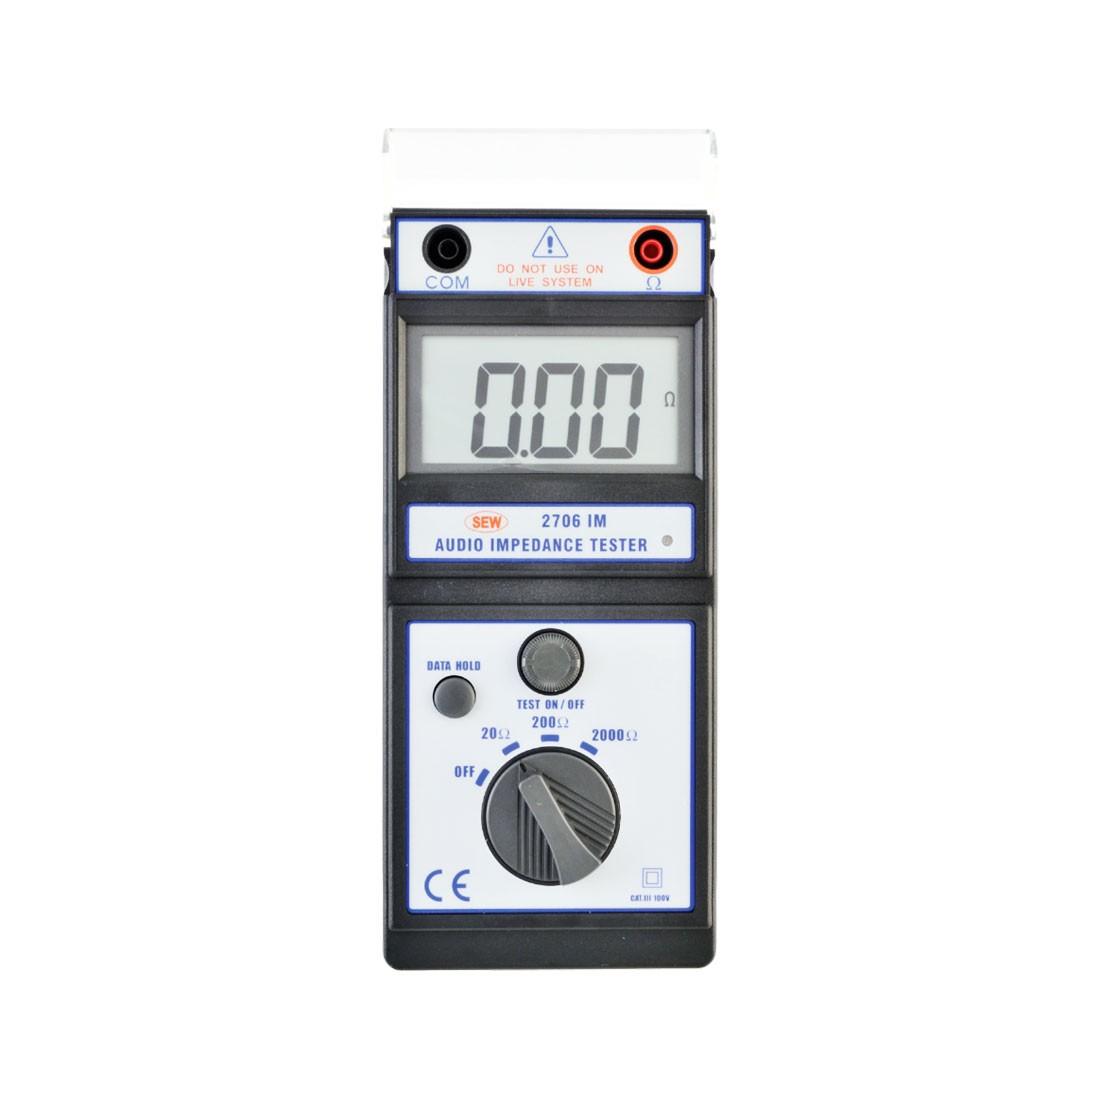 2706IM Audio Impedance Tester